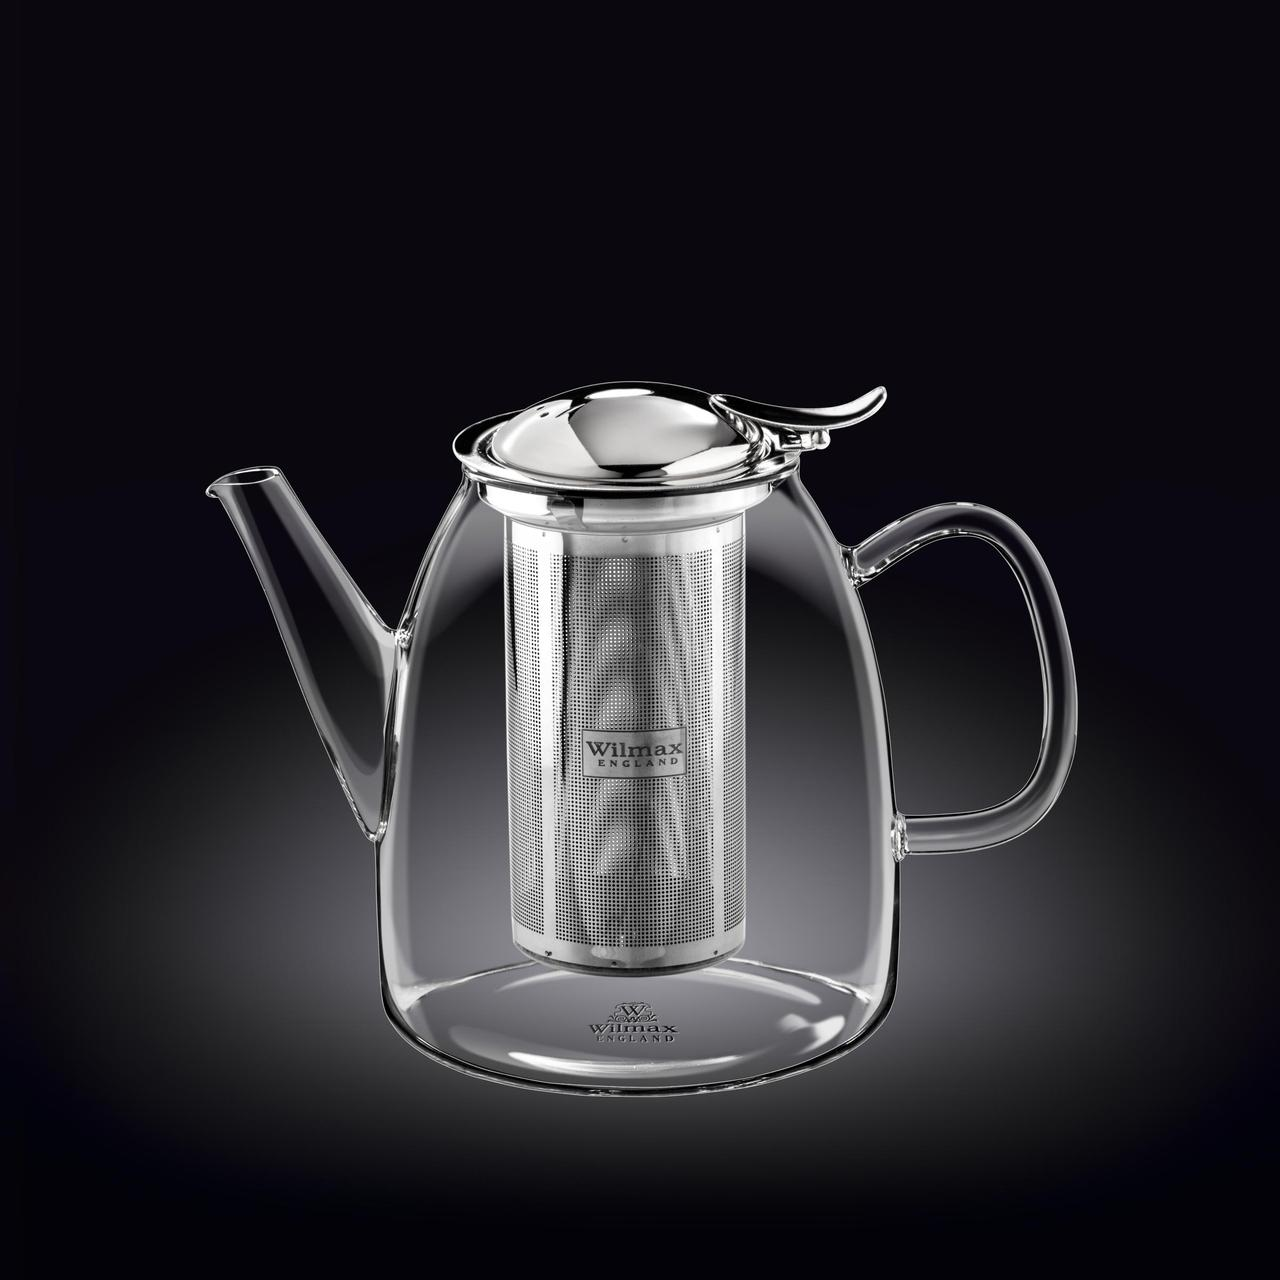 Чайник заварочный 950 мл Thermo Wilmax Нержавеющий фильтр